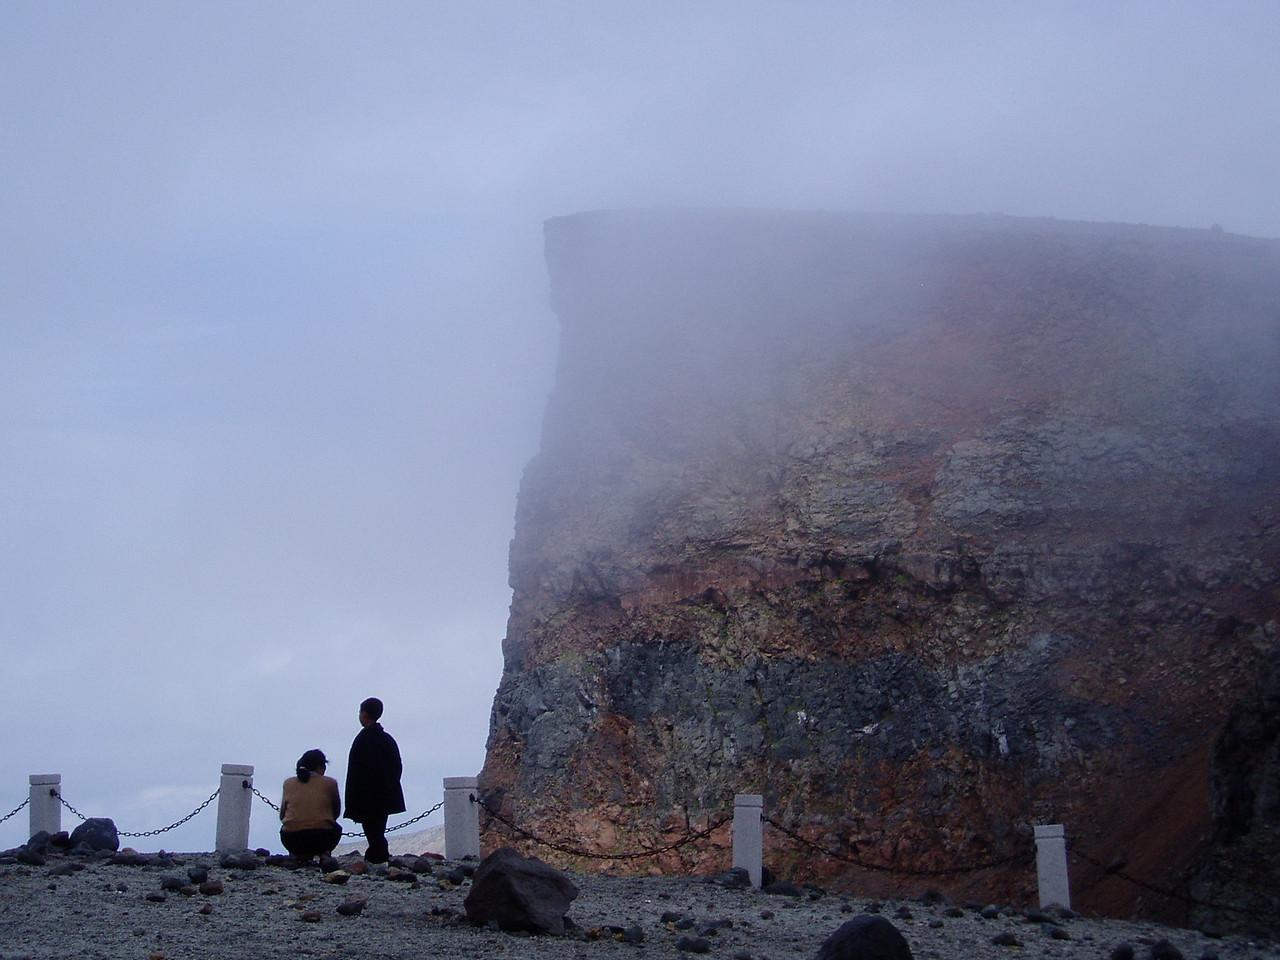 Paekdu in the mist